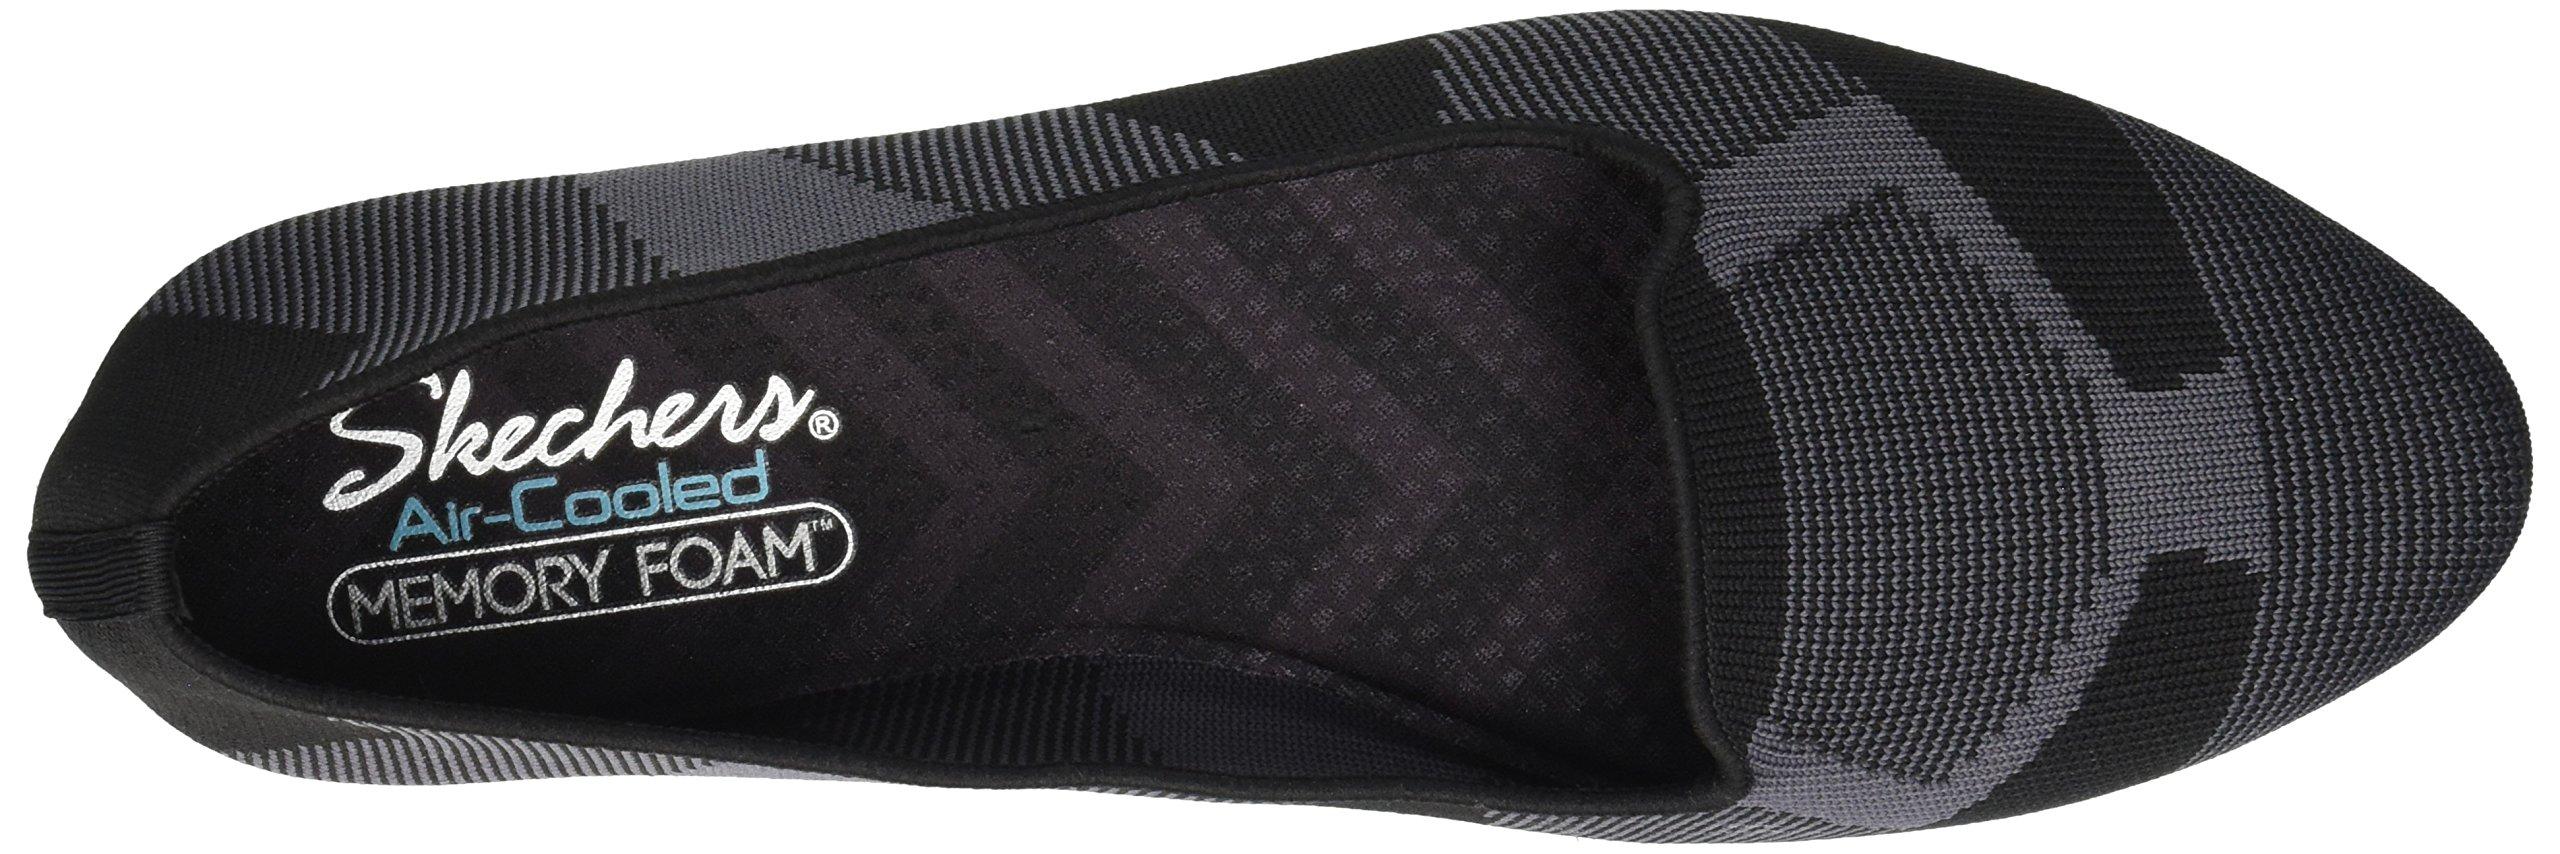 Skechers Women's Cleo-Sherlock-Engineered Knit Loafer Skimmer Ballet Flat, Black, 6.5 M US by Skechers (Image #7)